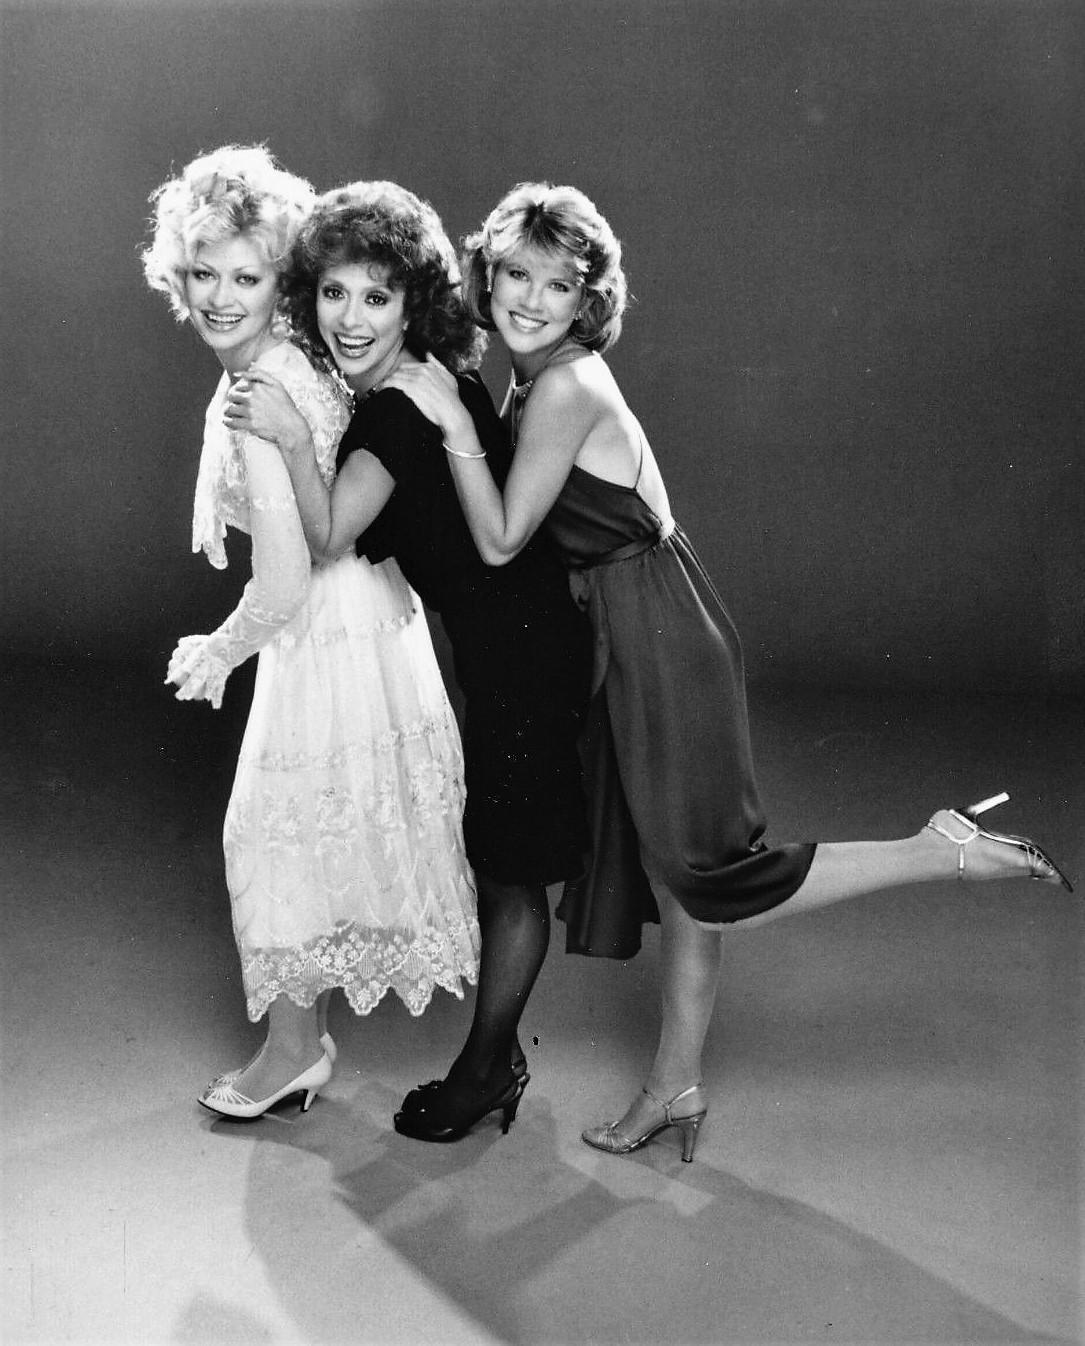 Rita Moreno, Leah Ayres, and Rachel Dennison in 9 to 5 (1982)